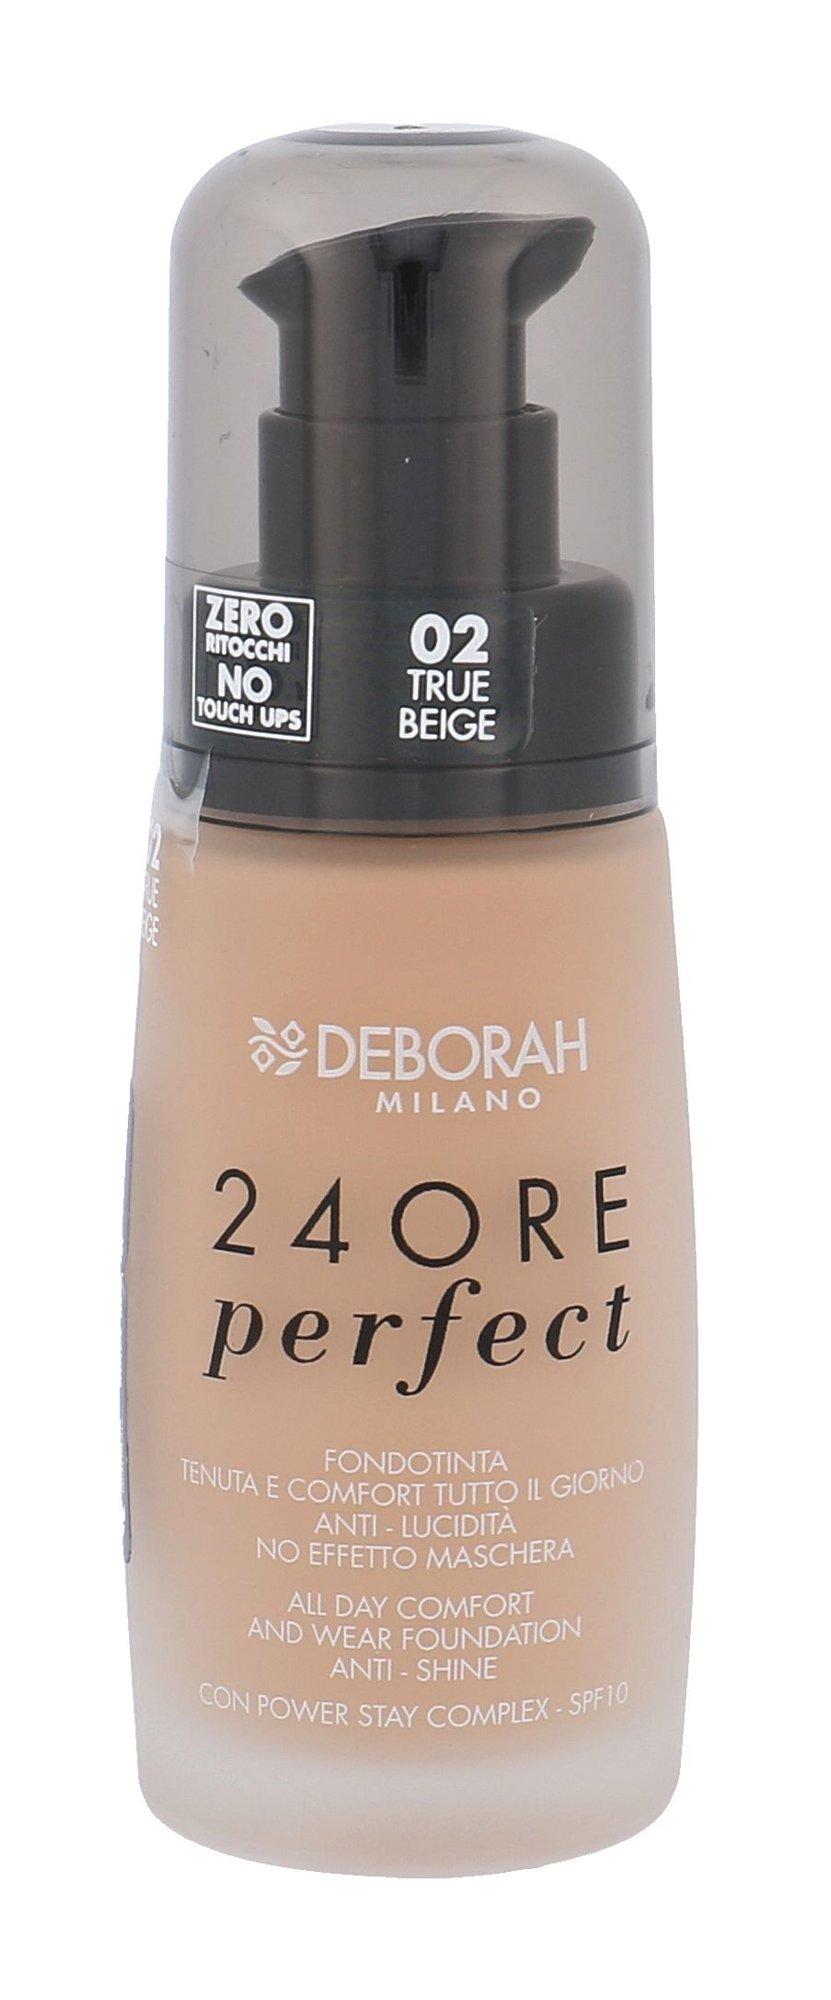 Deborah Milano 24Ore Cosmetic 30ml 02 True Beige